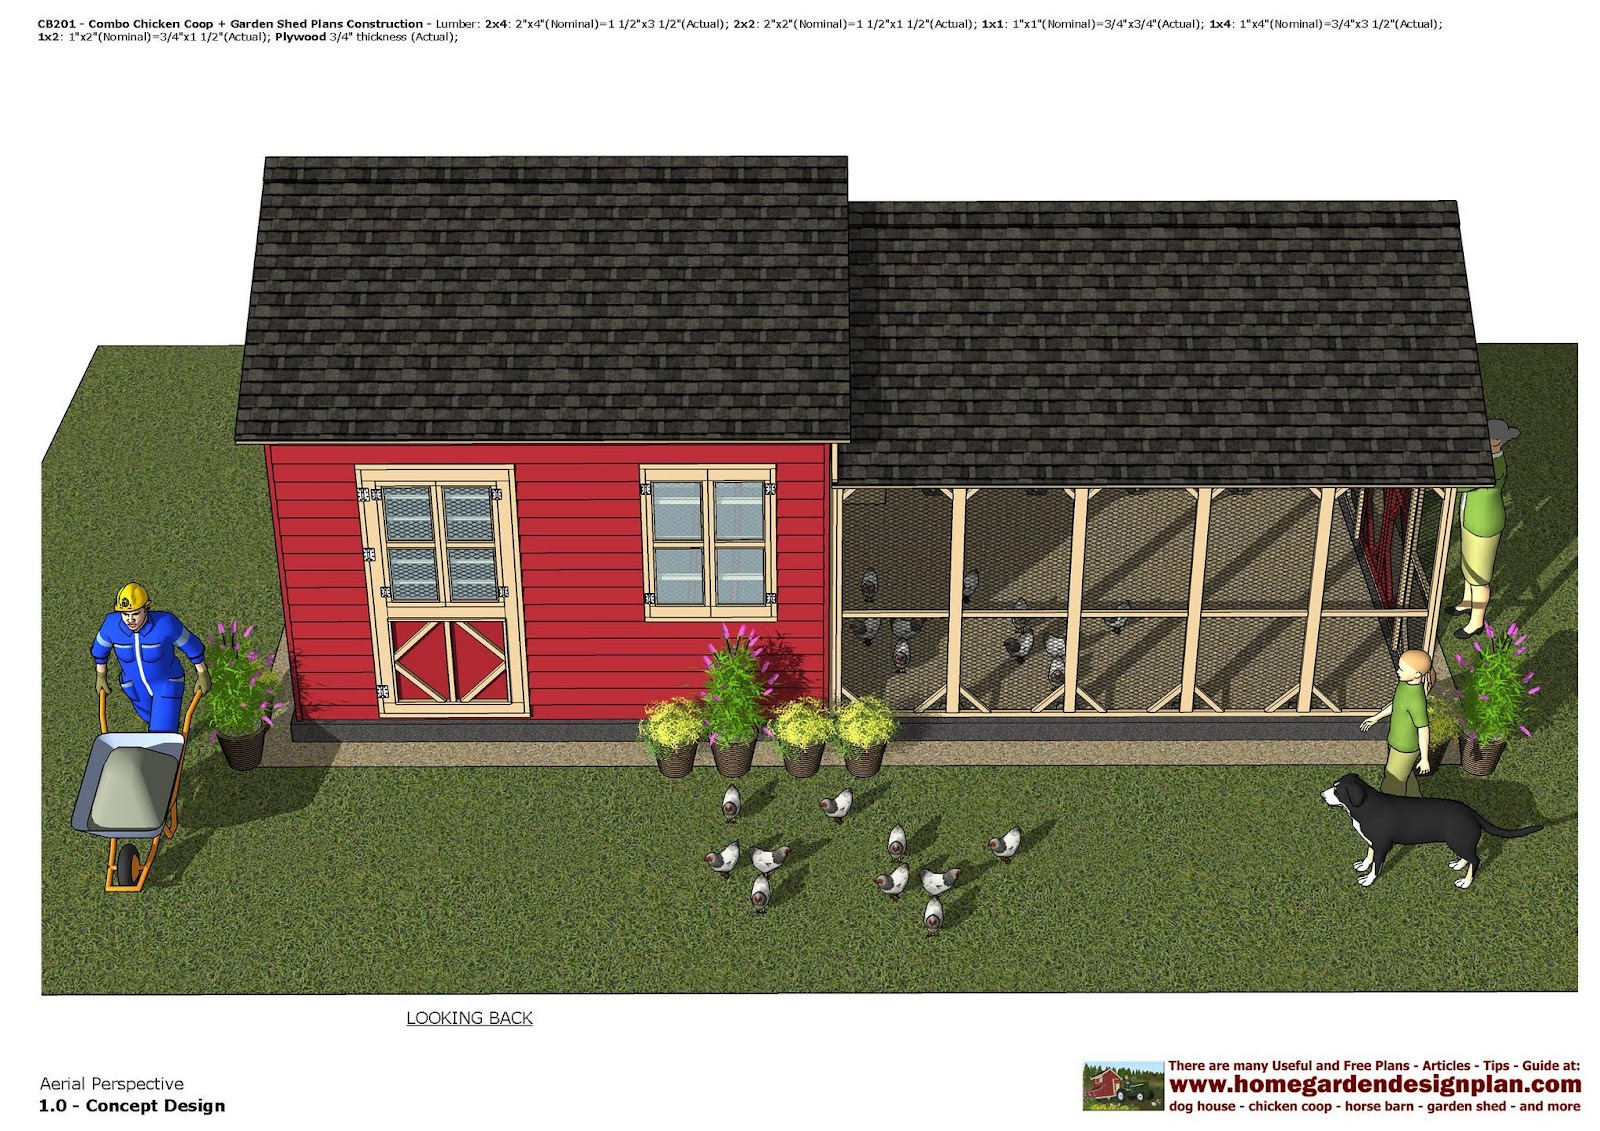 home garden plans CB201 Combo Chicken Coop Garden Shed Plans – Chicken Coop With Garden Roof Plans